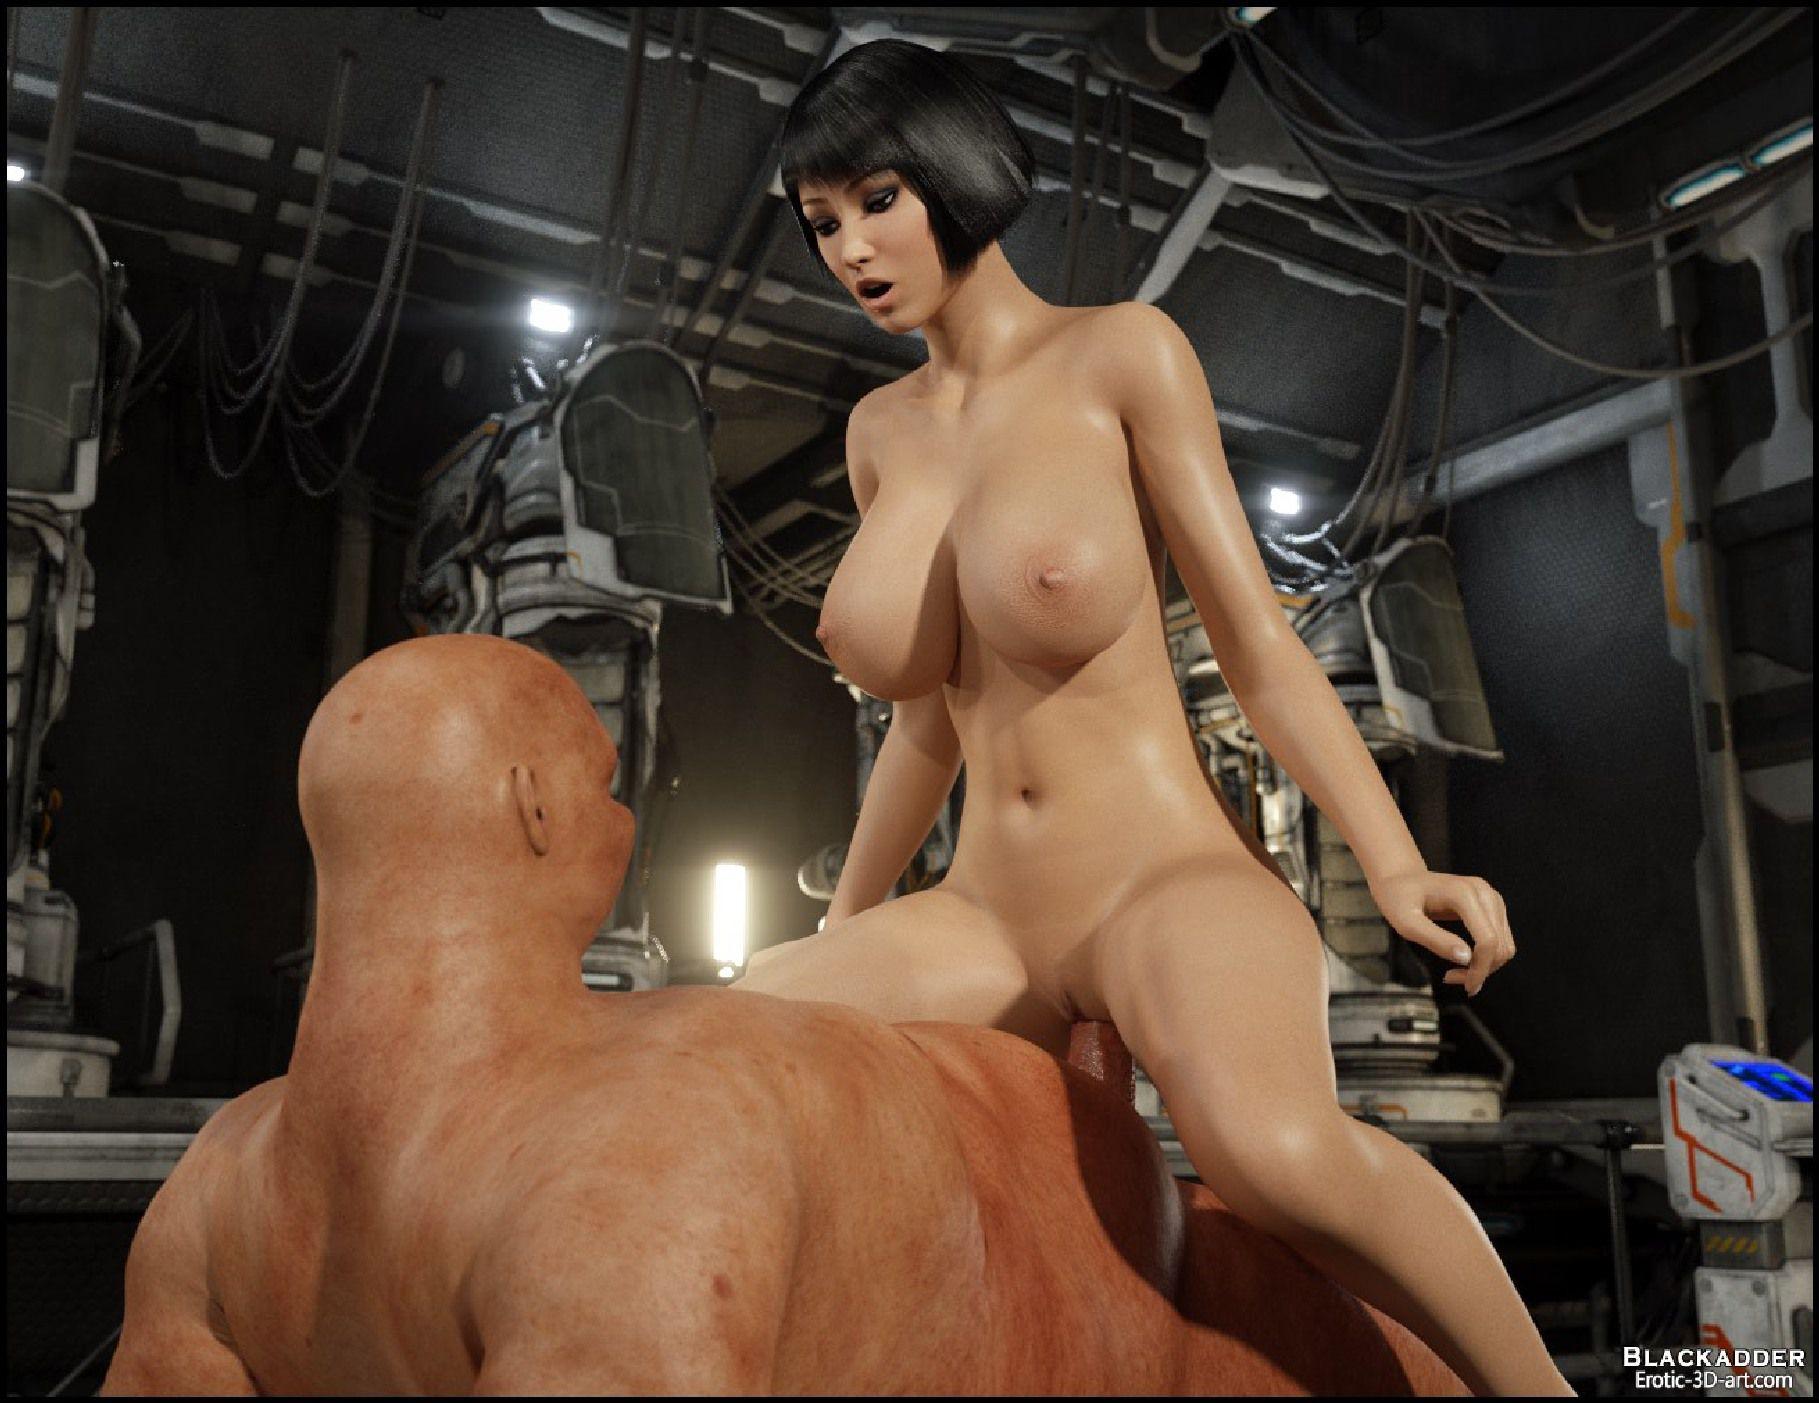 Fallout 3 mods nudity fucks pics